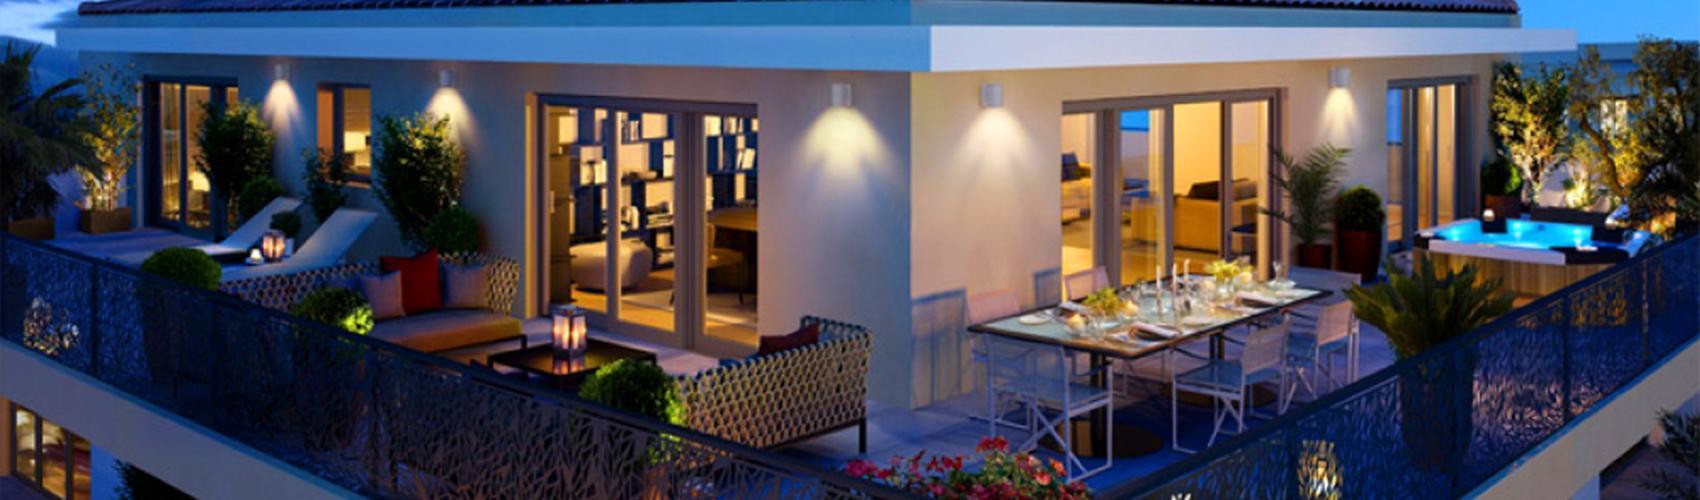 Photo du programme immobilier neuf CAN-735 à Cannes